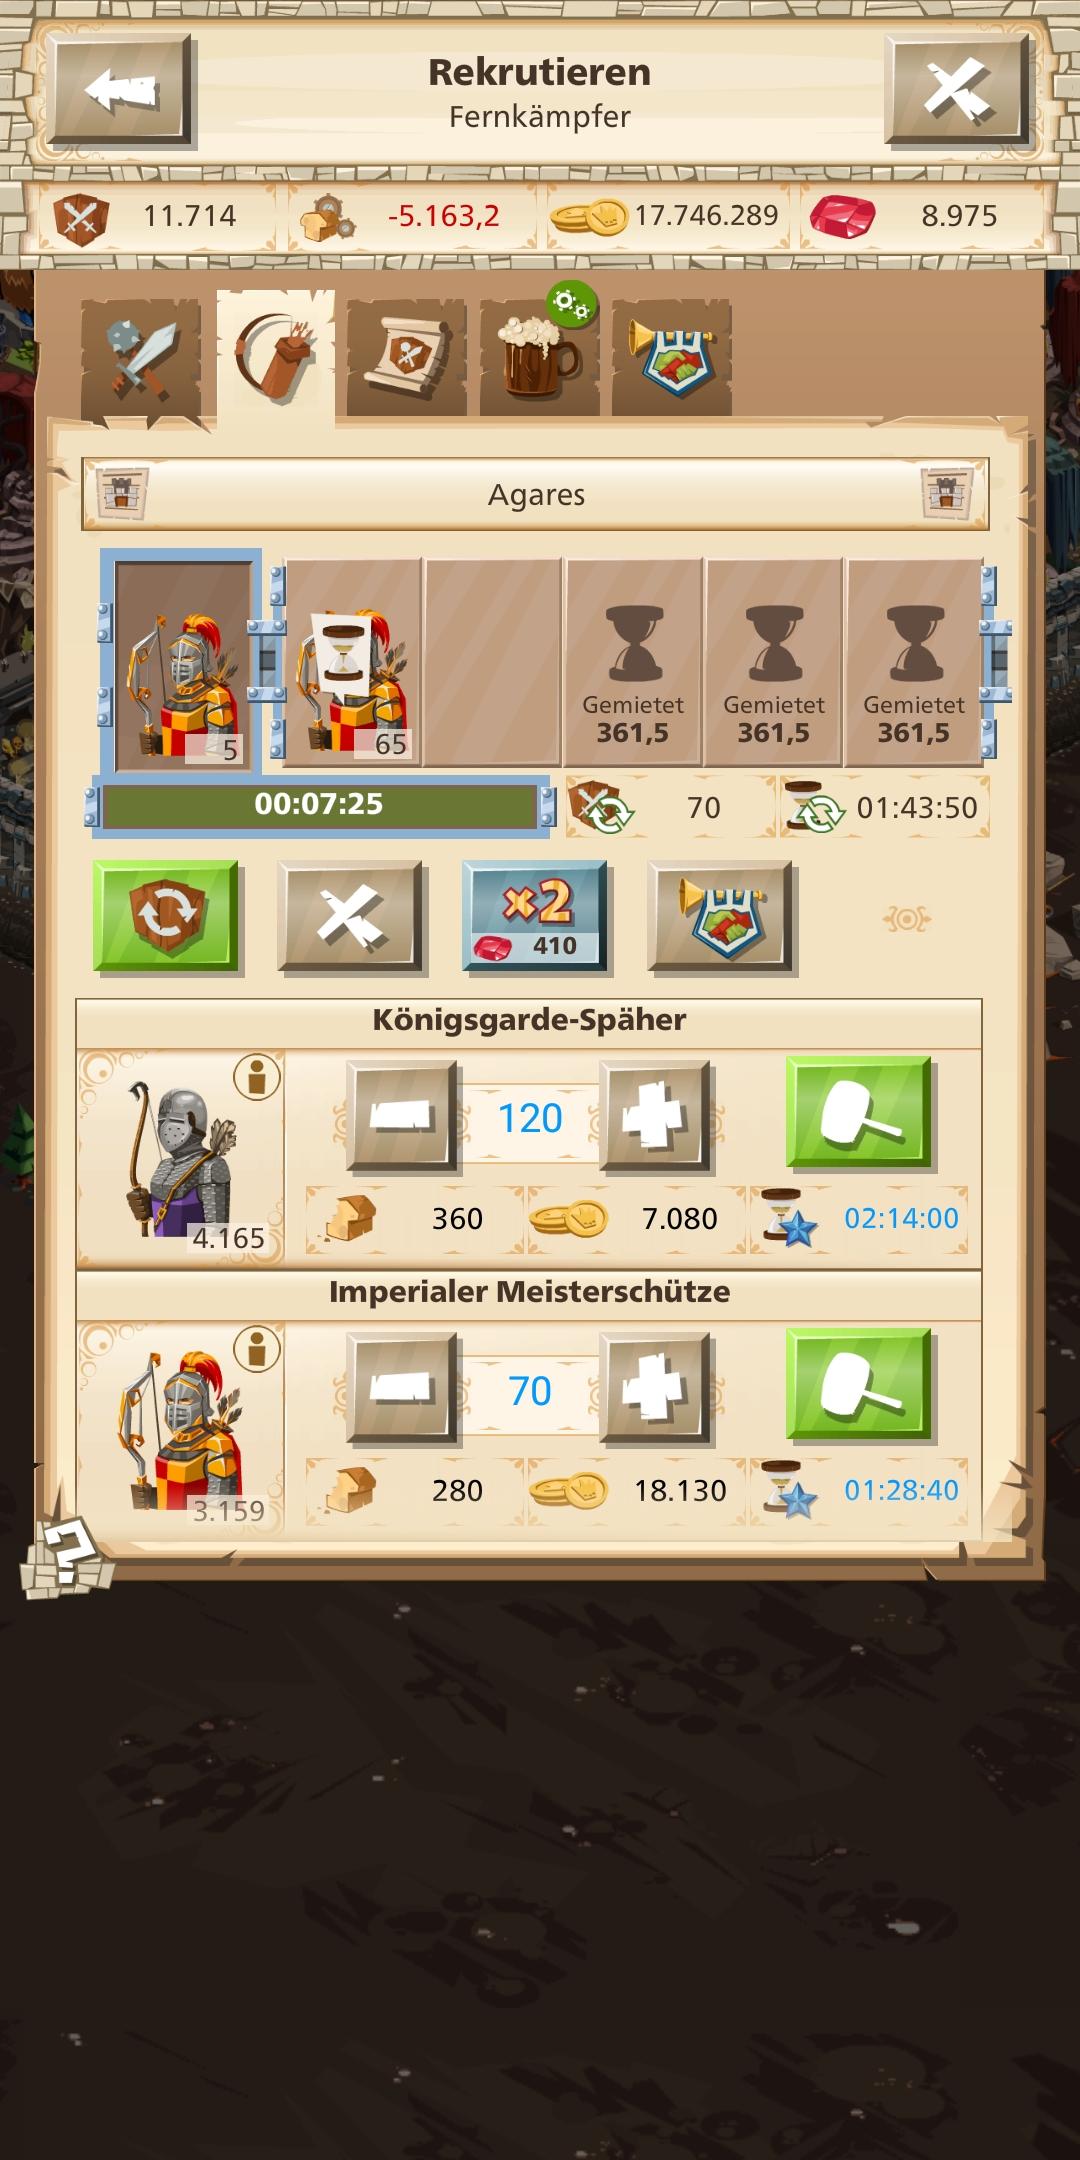 Screenshot_20190527_201336_air.com.goodgamestudios.empirefourkingdoms.jpg